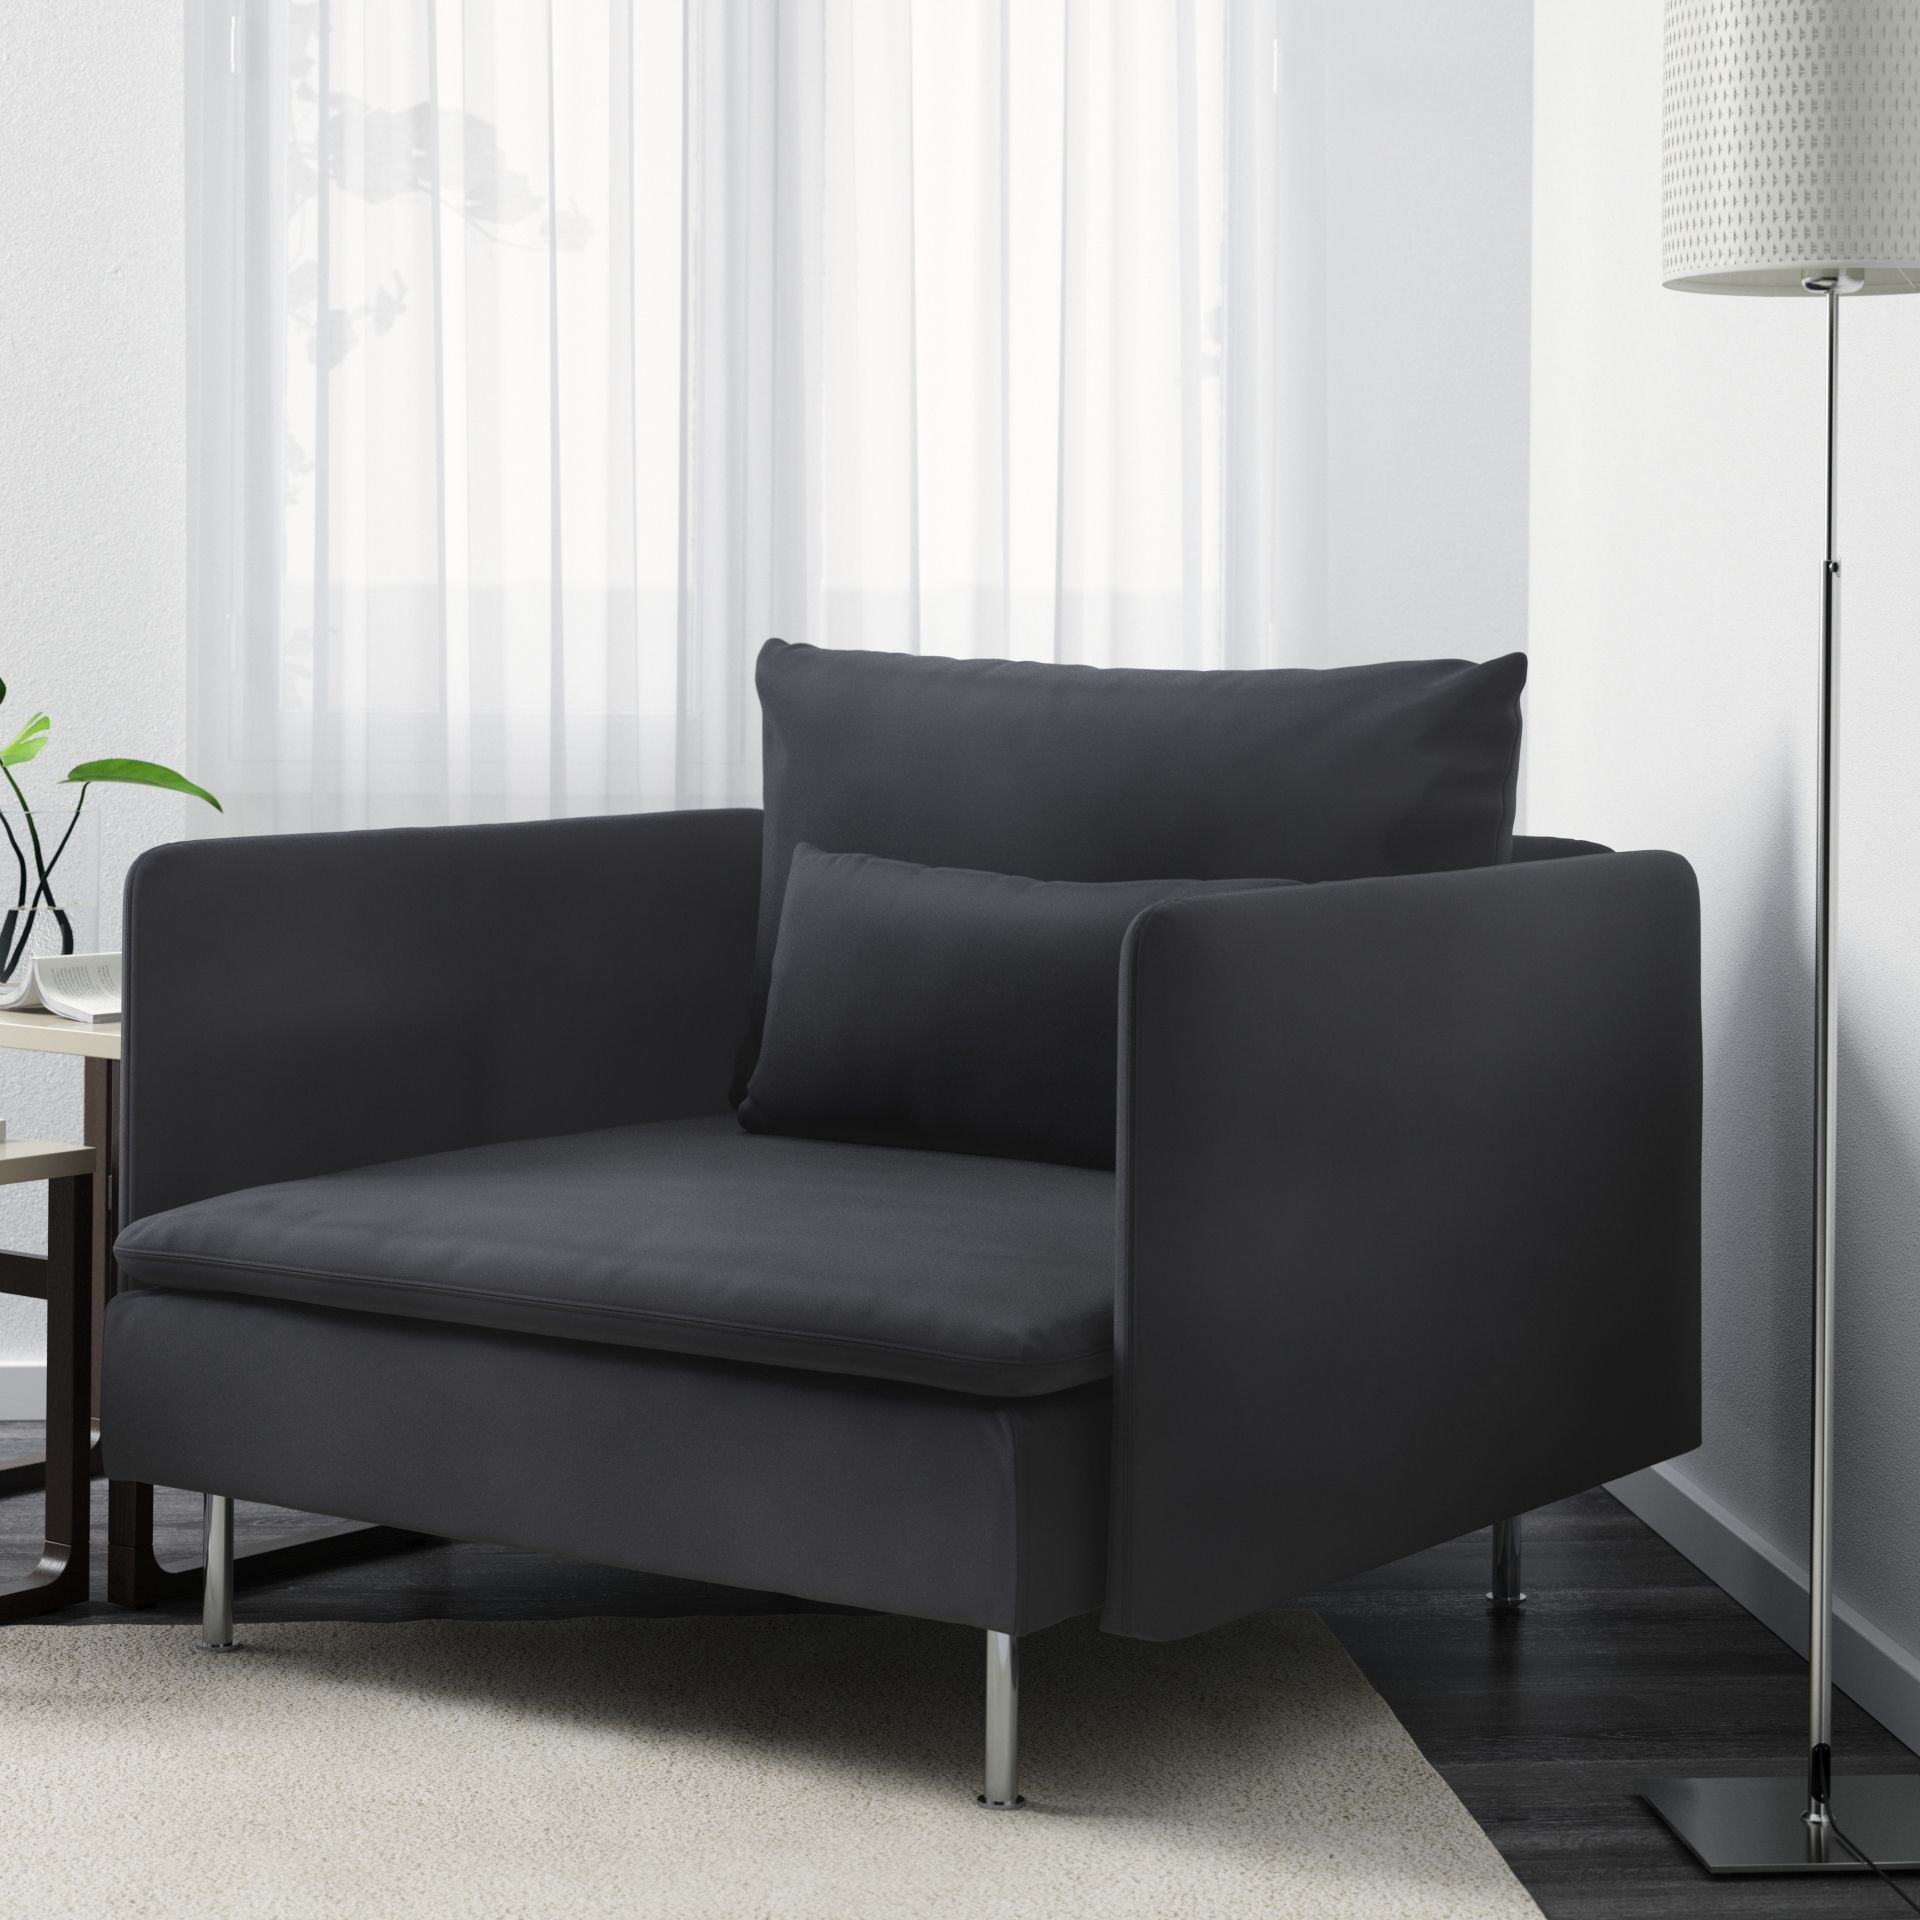 SÖDERHAMN fauteuil   IKEA IKEAnl IKEAnederland inspiratie ...